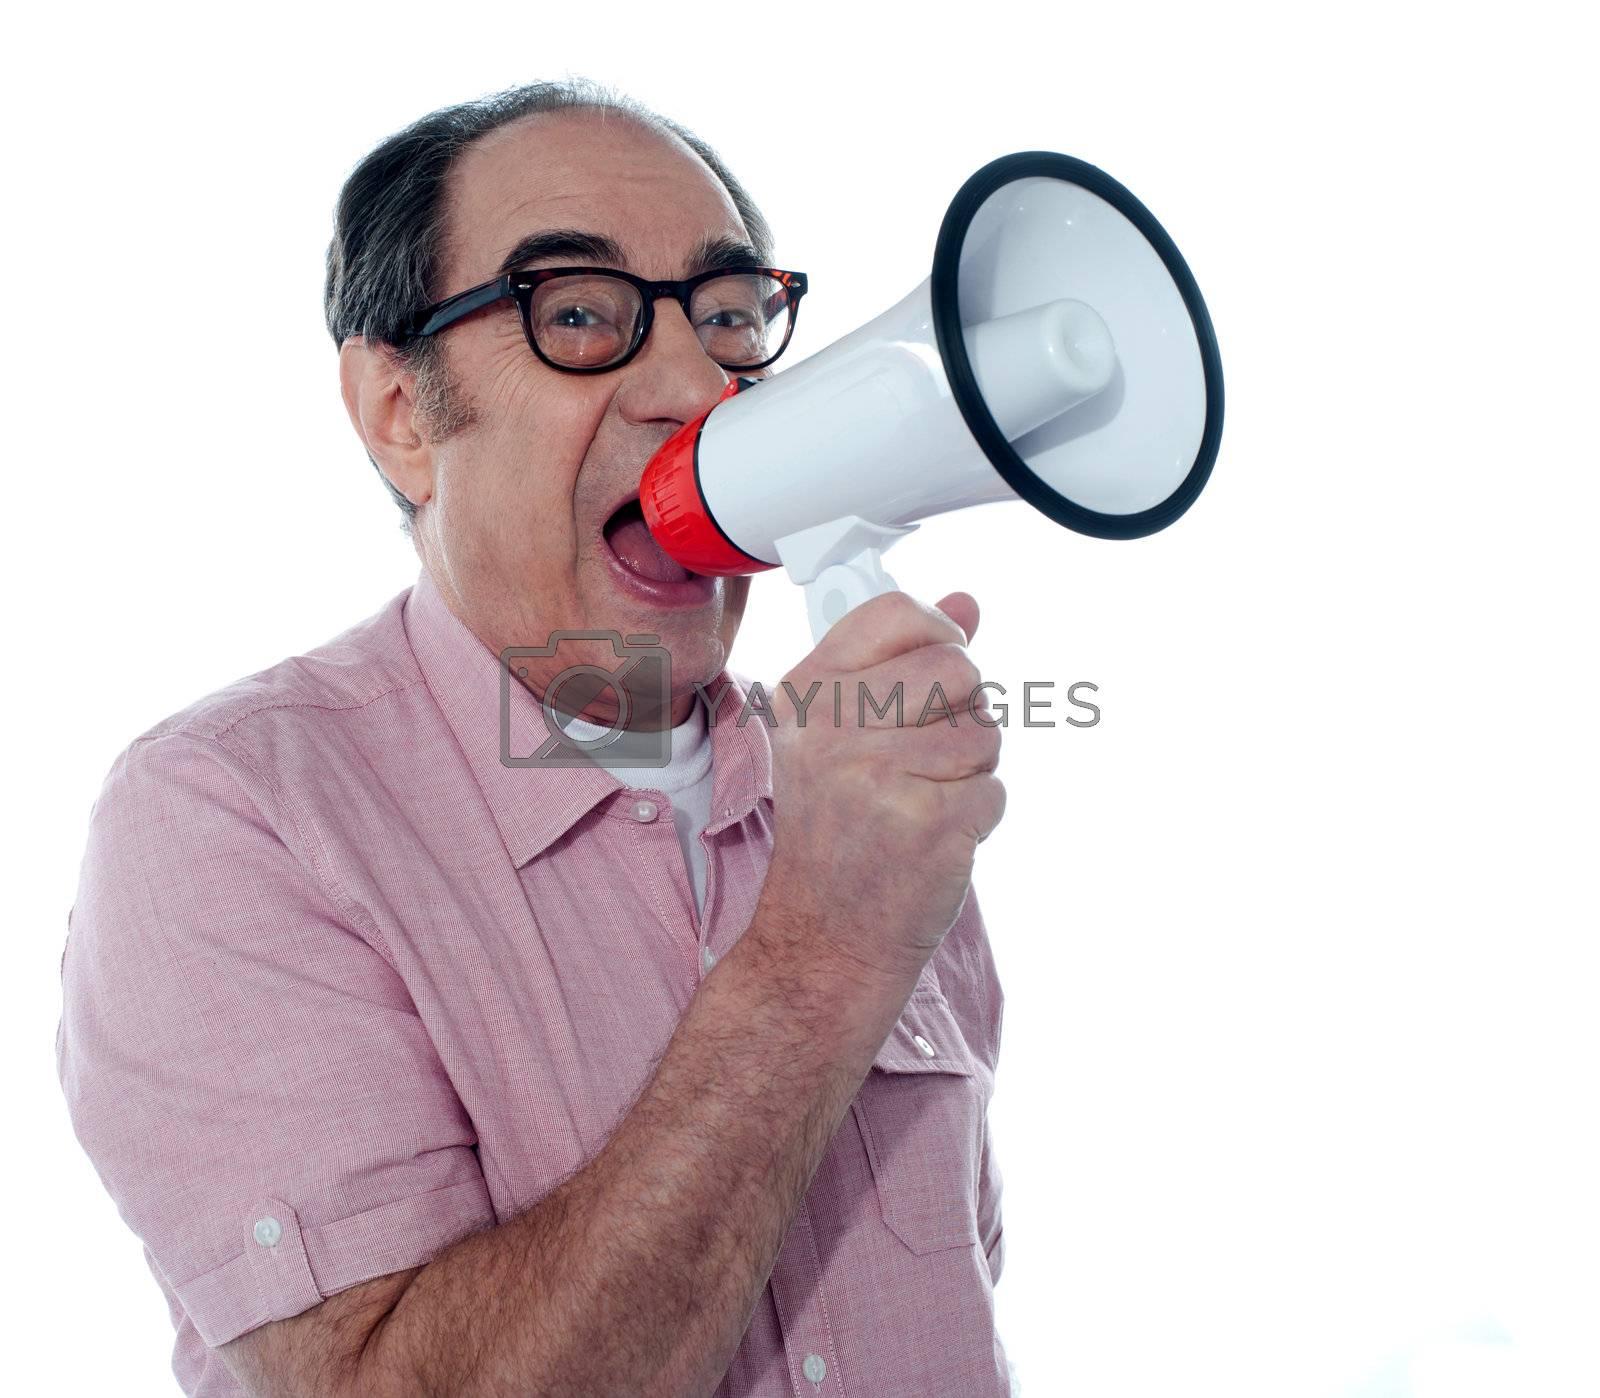 Senior male screaming loudly in a megaphone